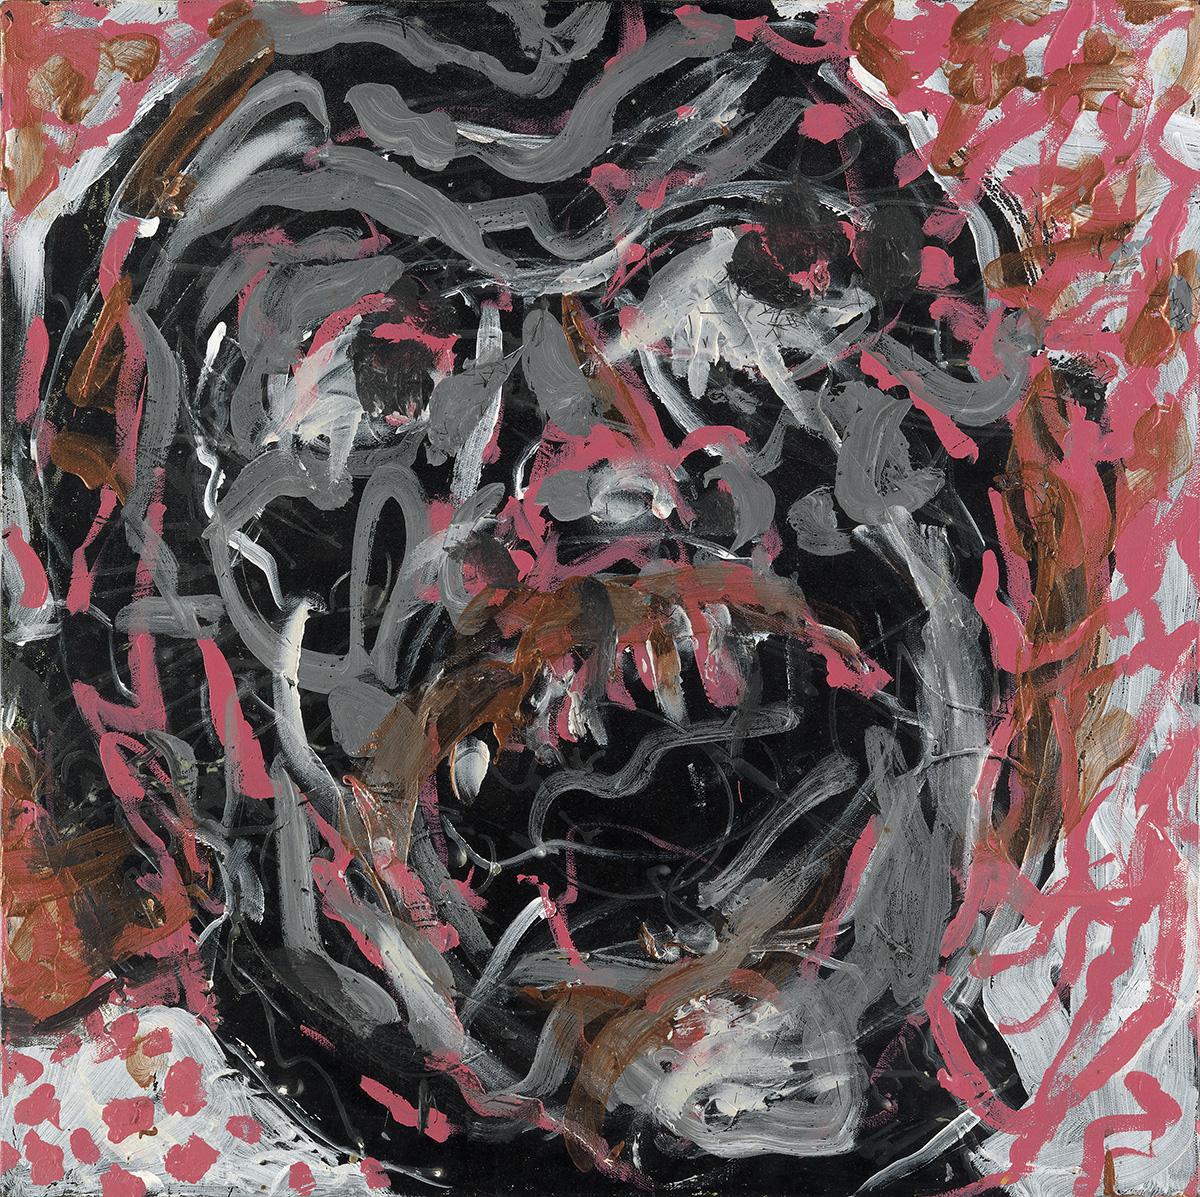 PAUL-SHARITS-UntitledUnbetiteltes-Portrait